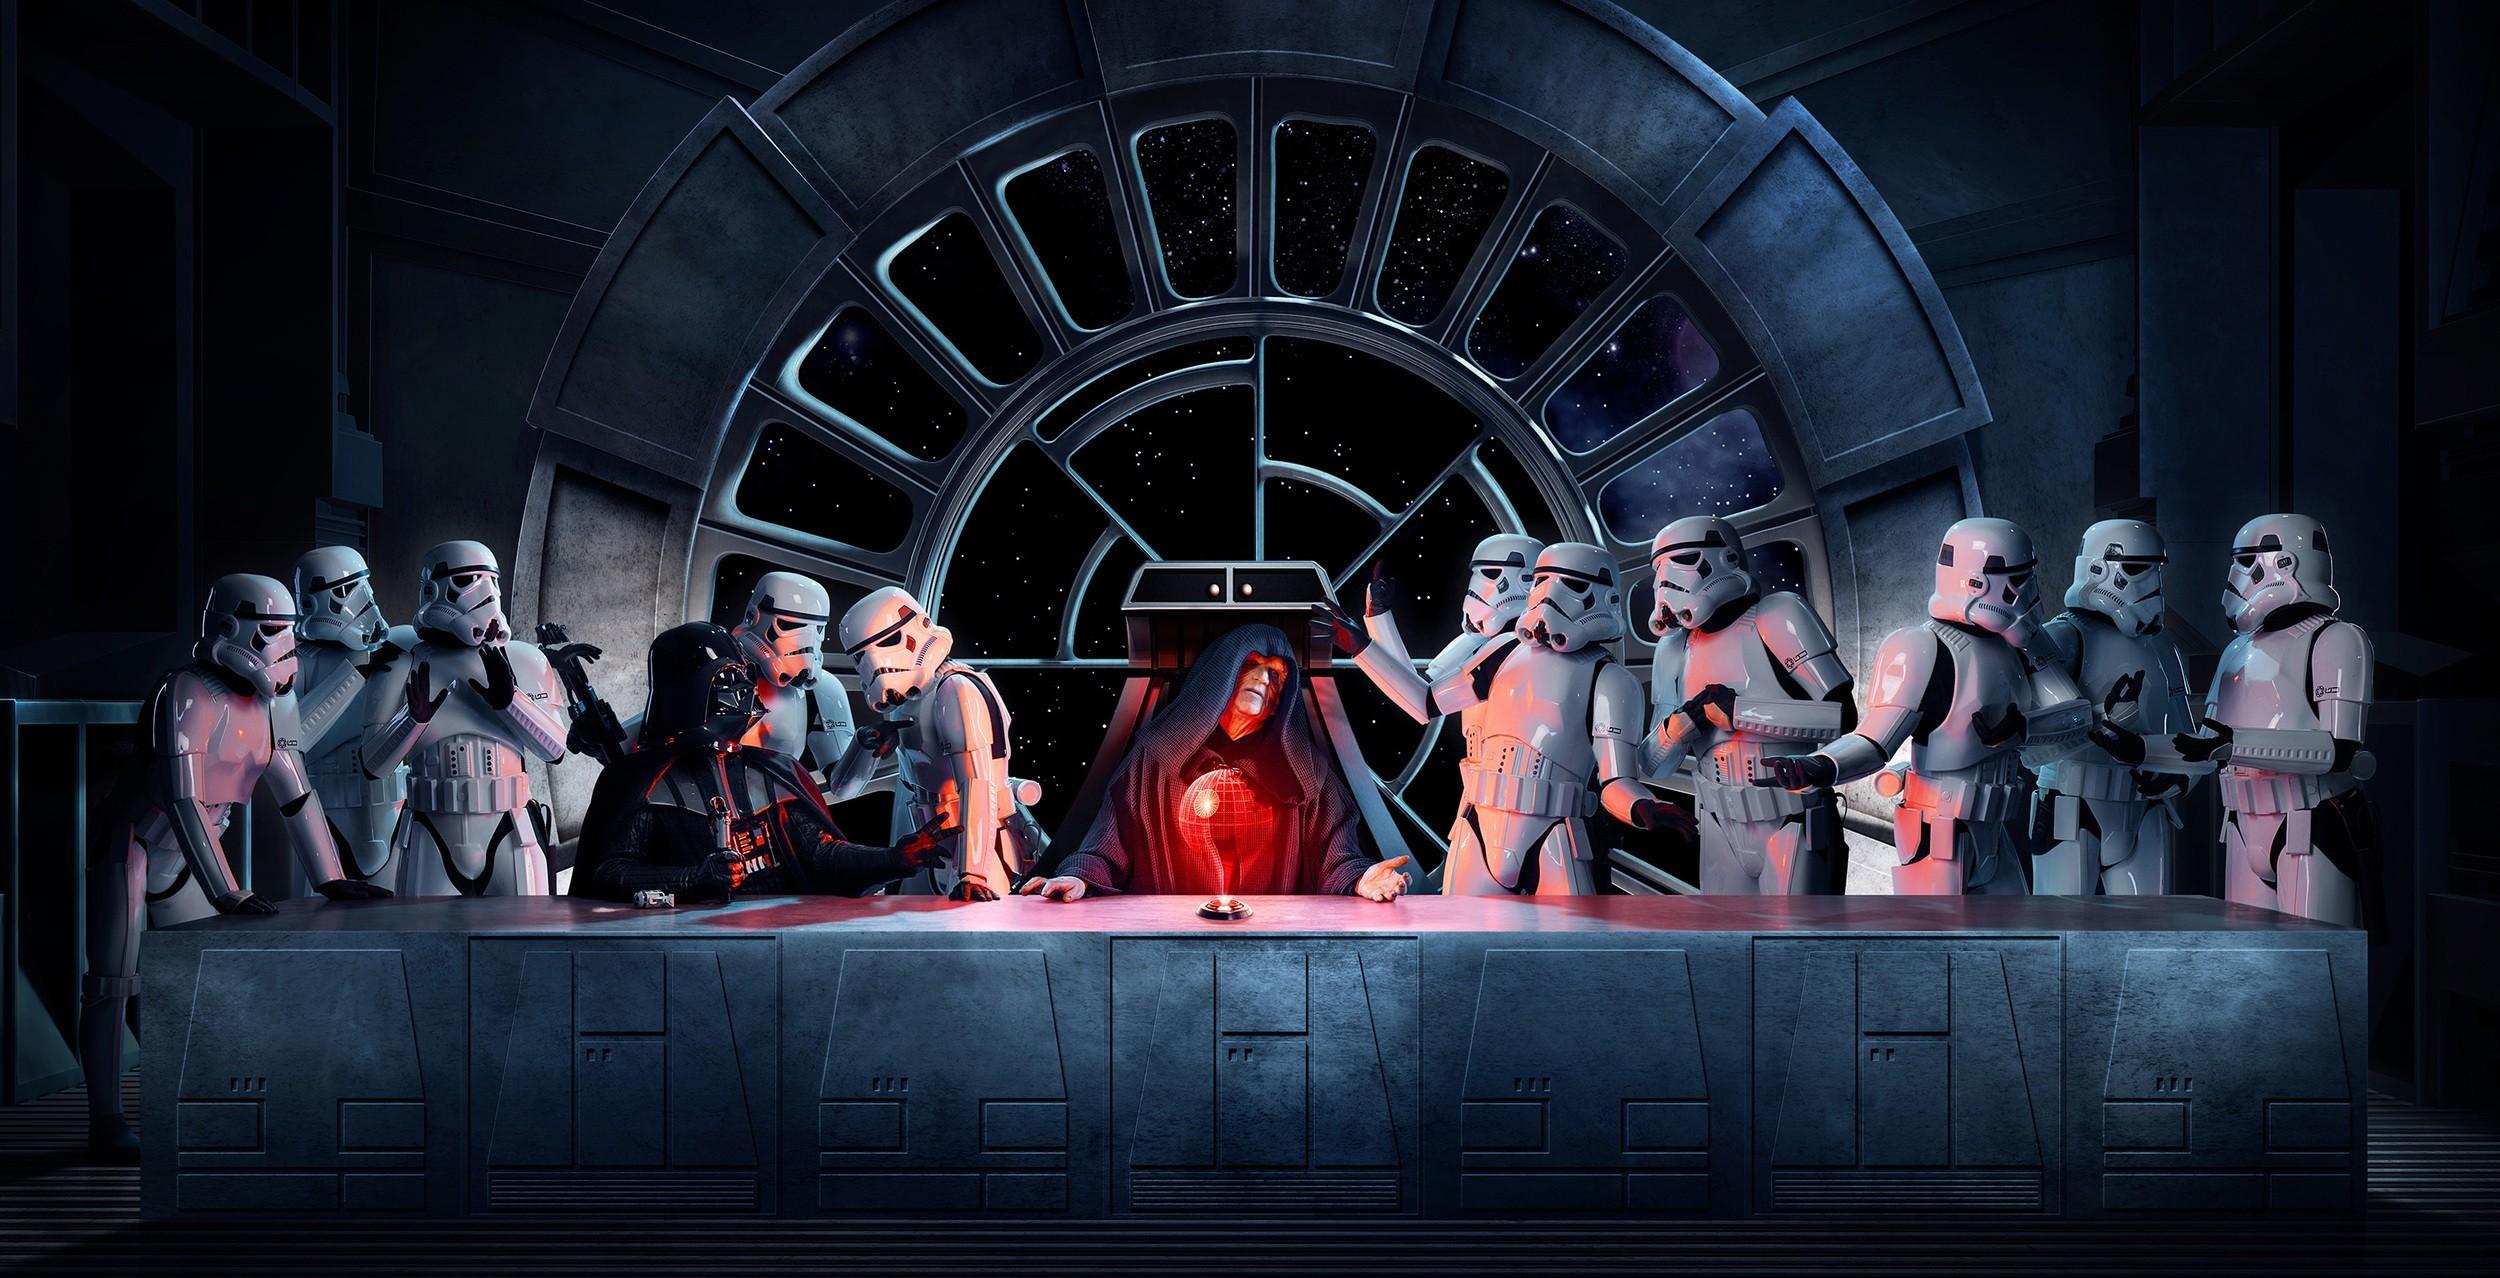 General Star Wars Darth Vader Emperor Palpatine stormtrooper The  Last Supper